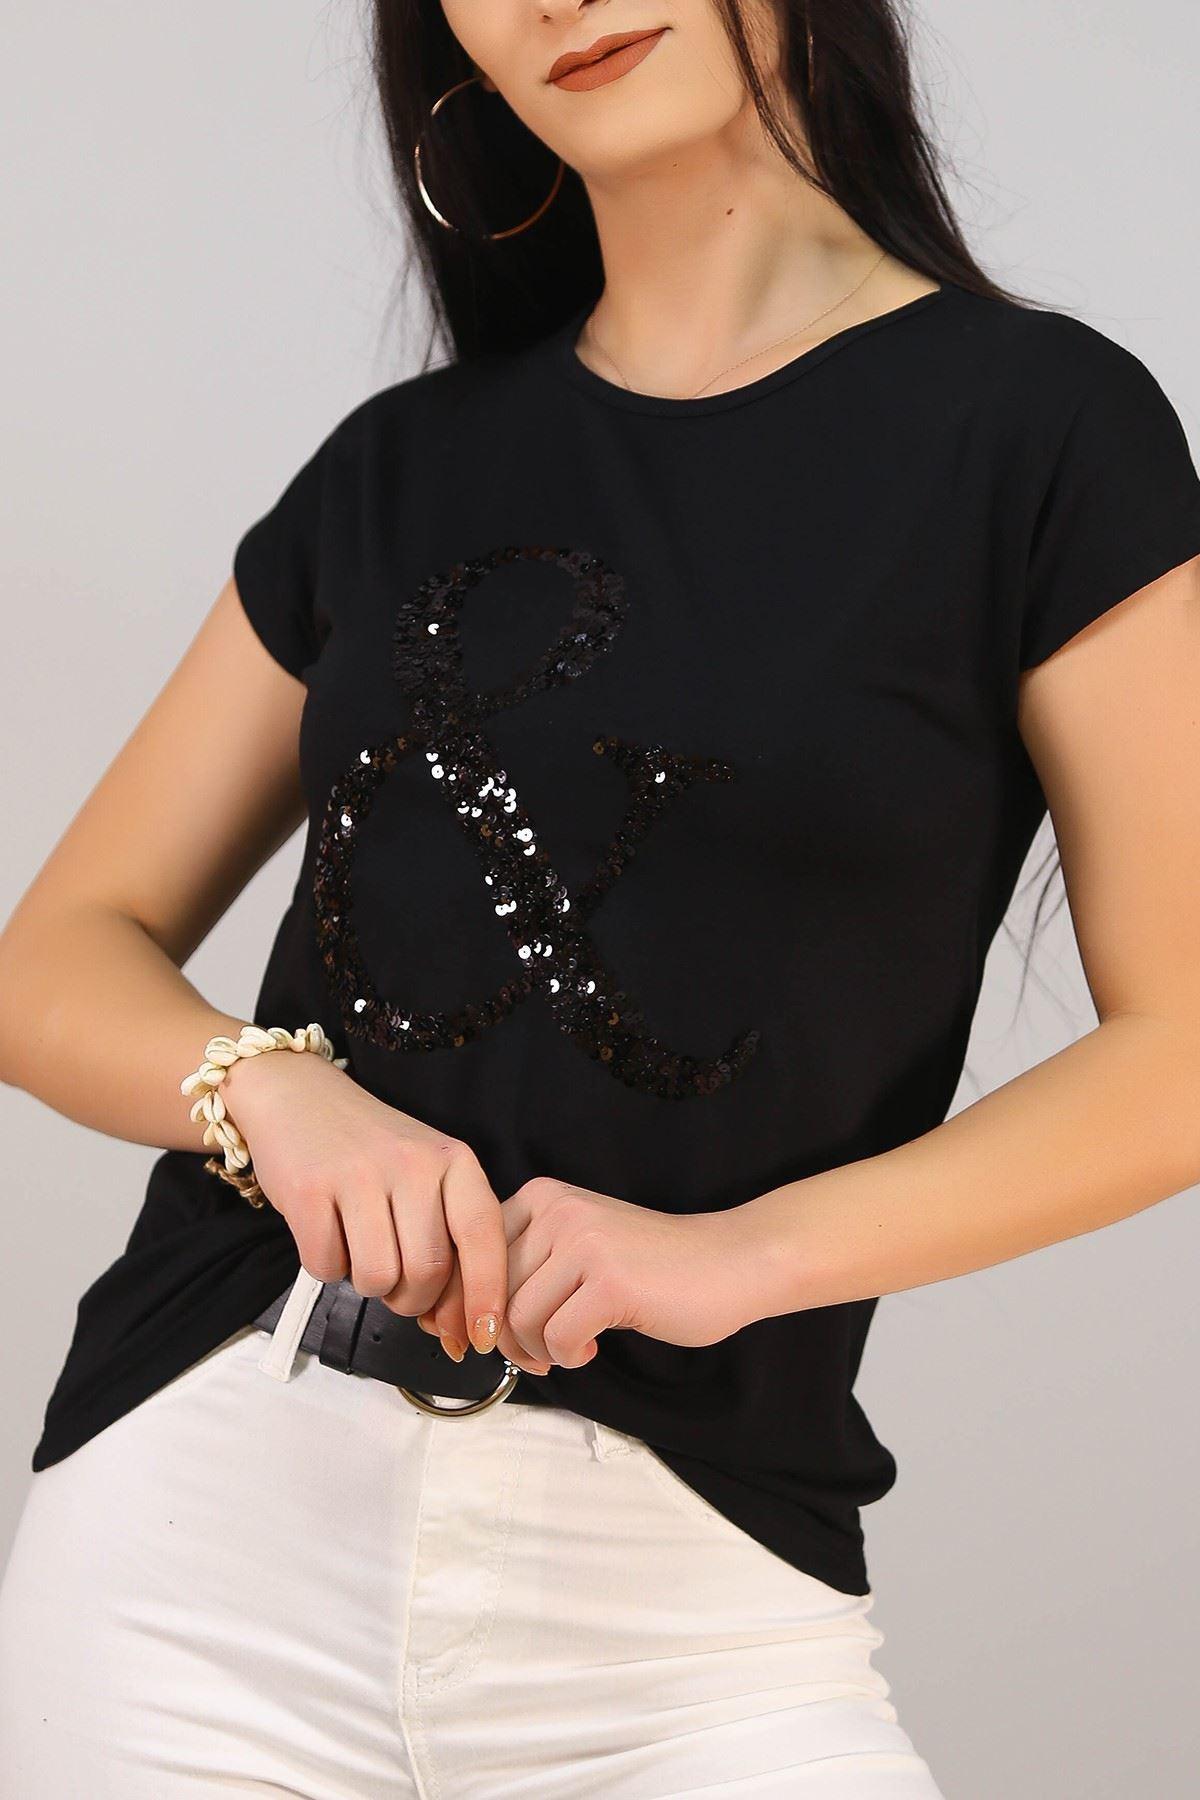 Pullu Tişört Siyah - 5027.139.